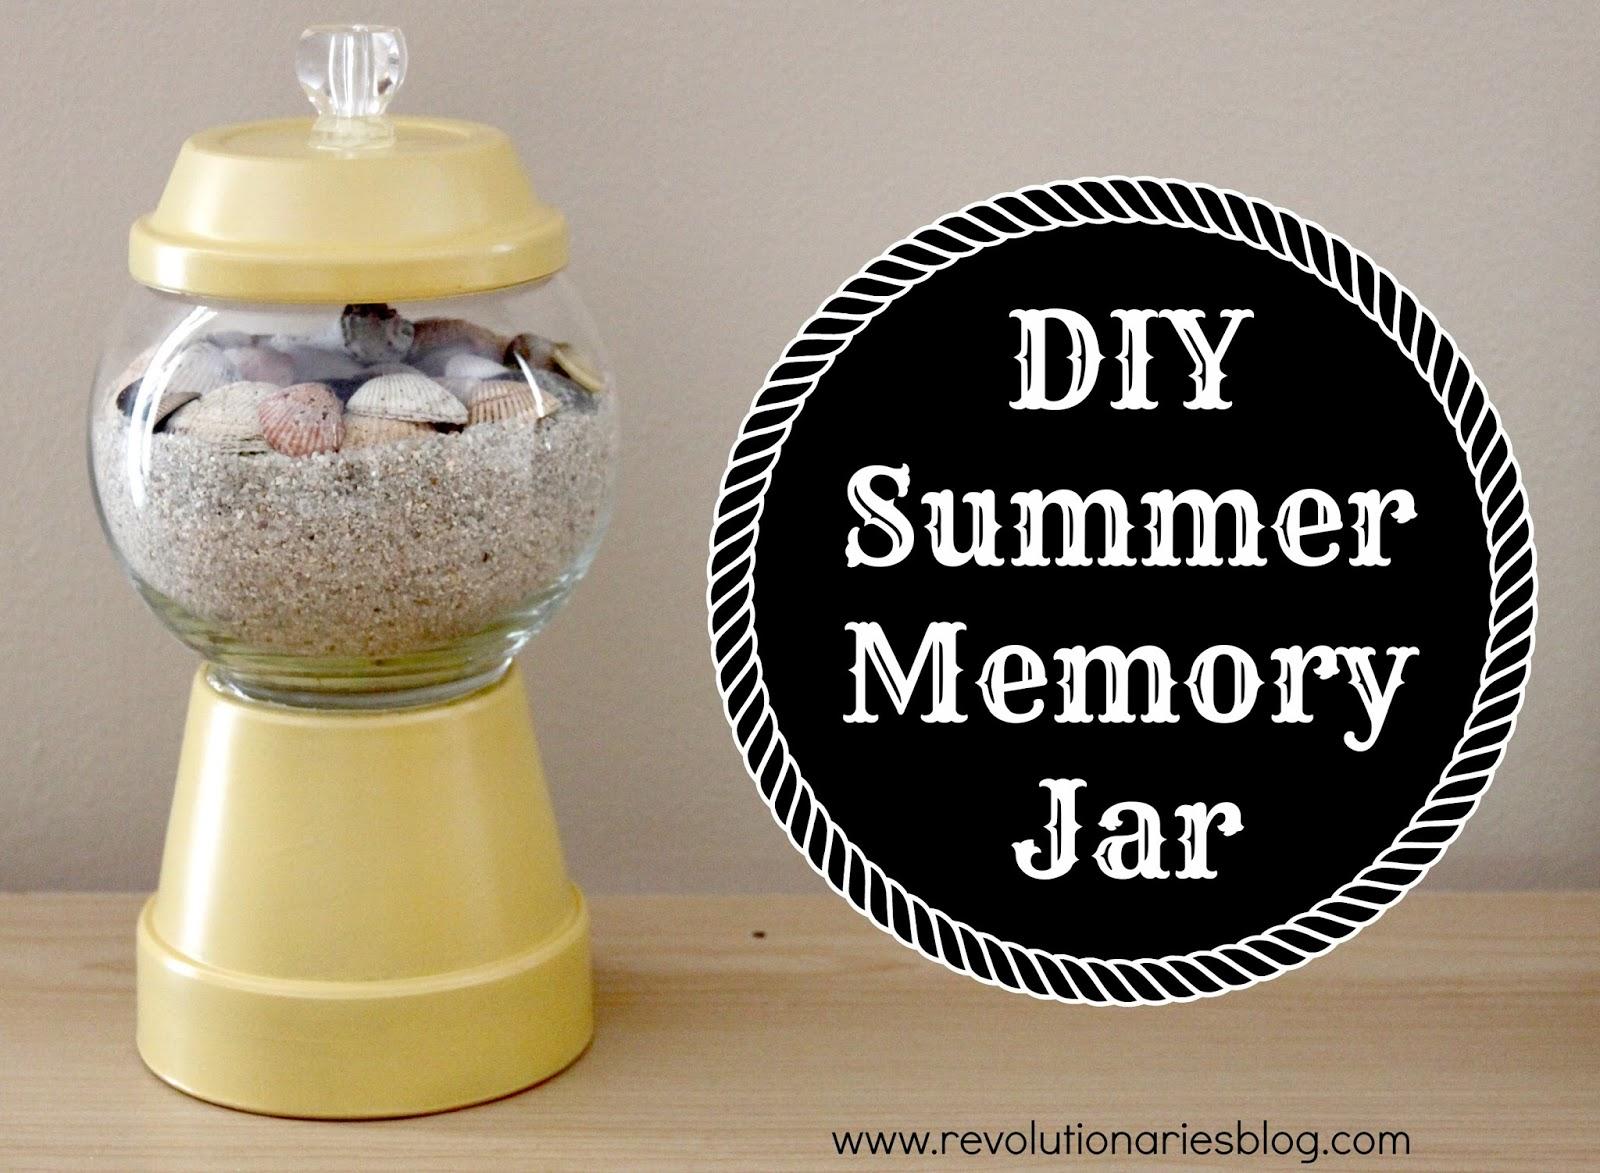 http://4.bp.blogspot.com/-S1AMPb_KGSg/Ue_USXInNDI/AAAAAAAAC1U/BgNRHf0H4Ig/s1600/diy-summer-memory-jar.jpg